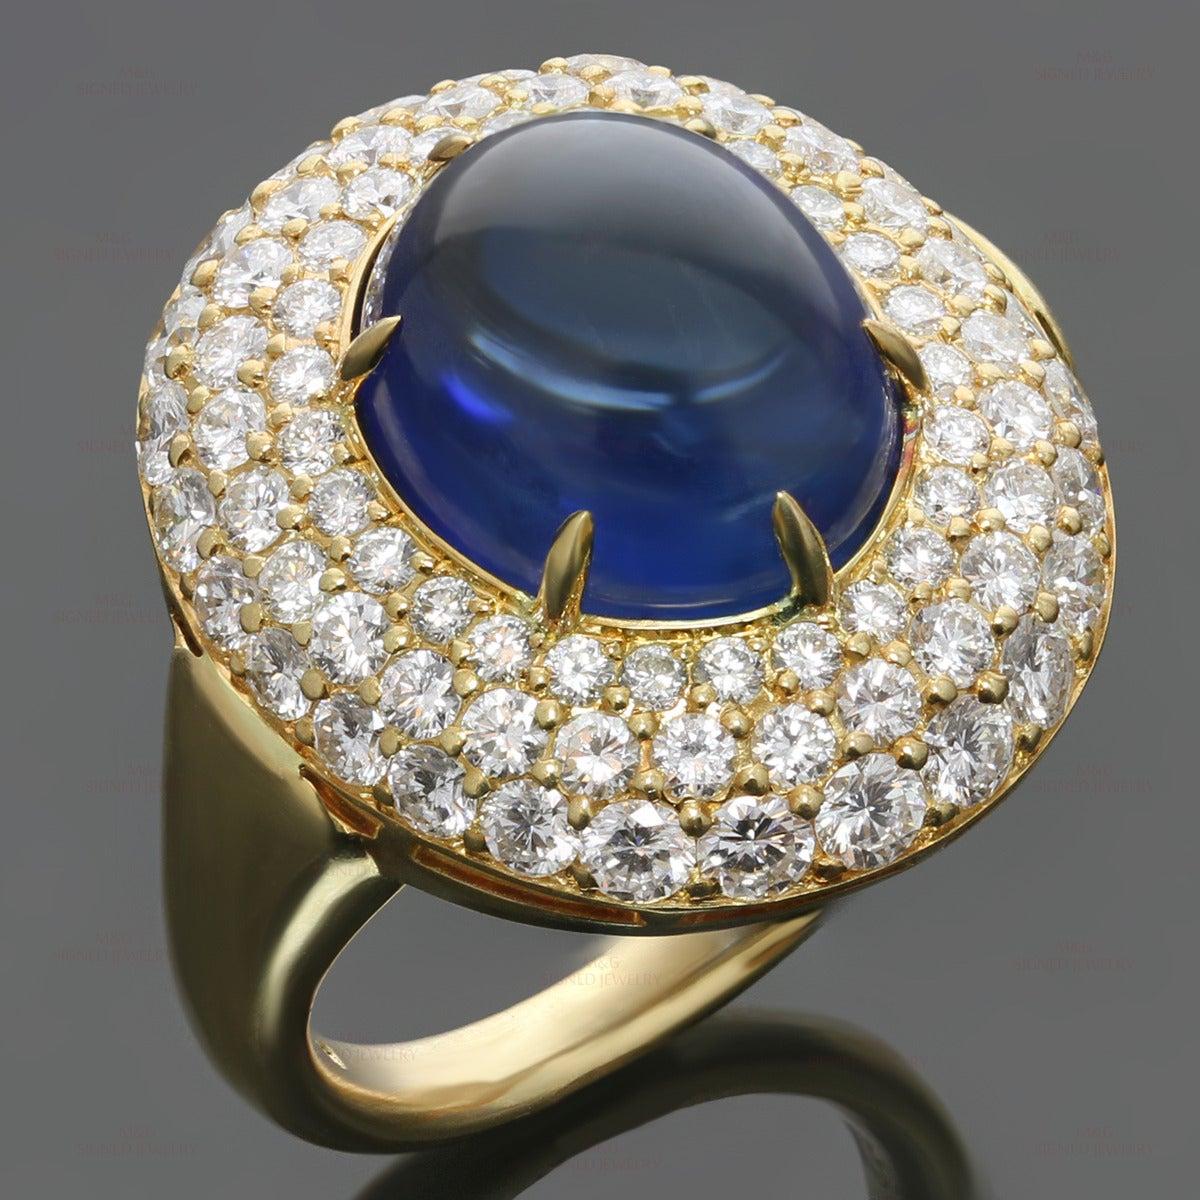 1980s harry winston blue sapphire diamond gold dome ring